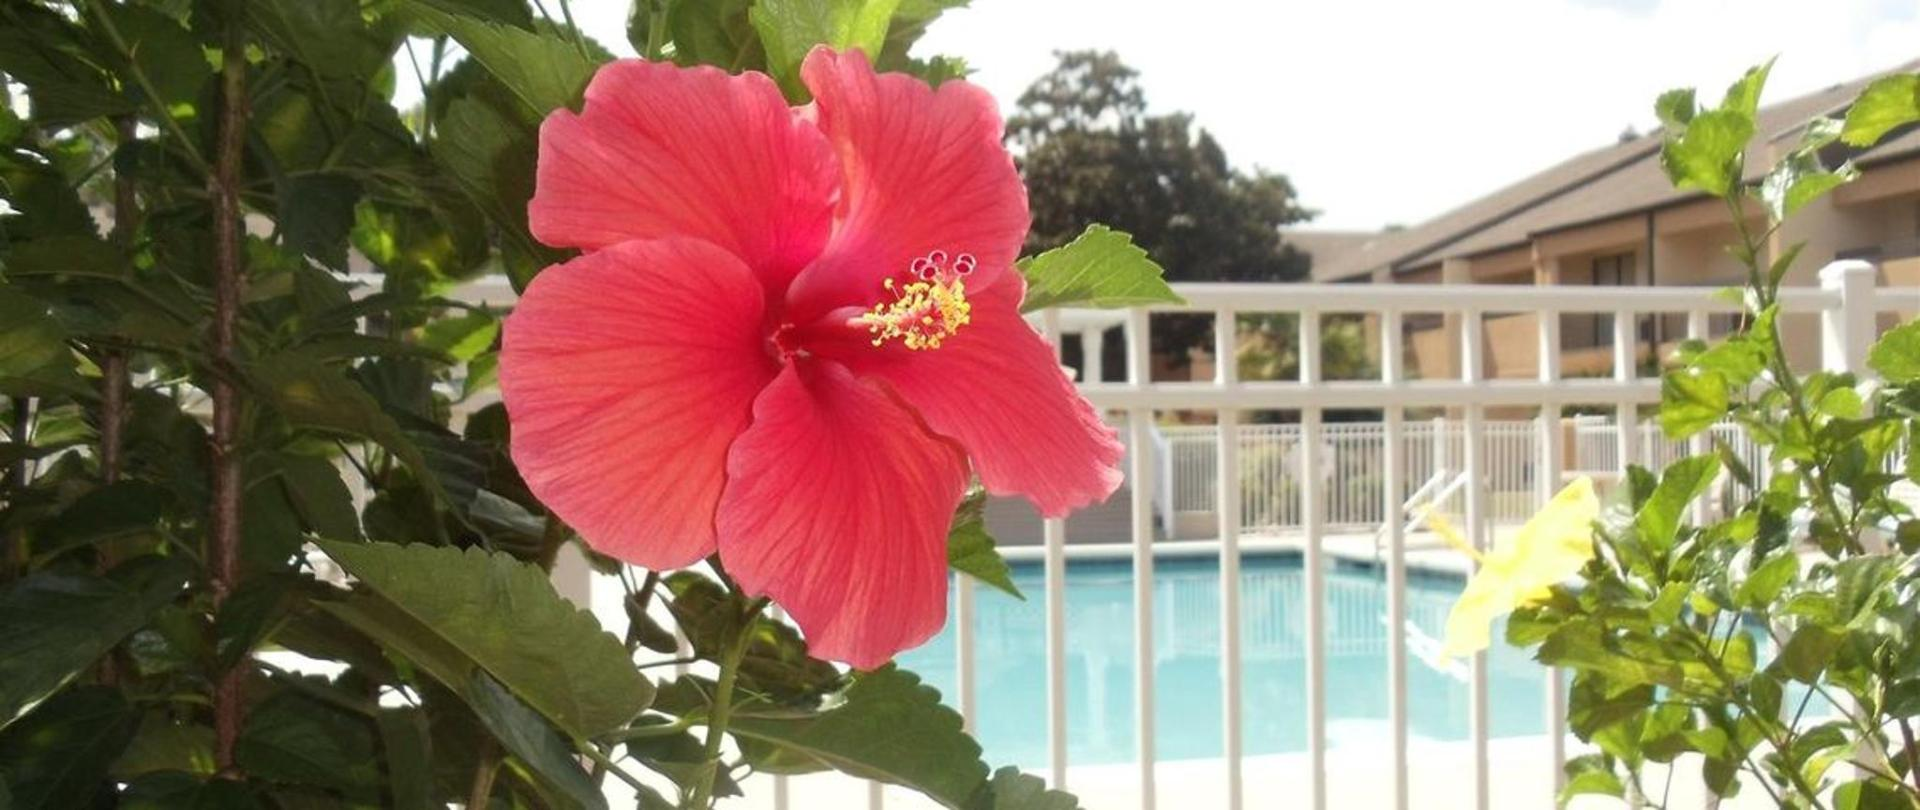 pool-flower-up-close.JPG.1140x481_0_171_5937.JPG